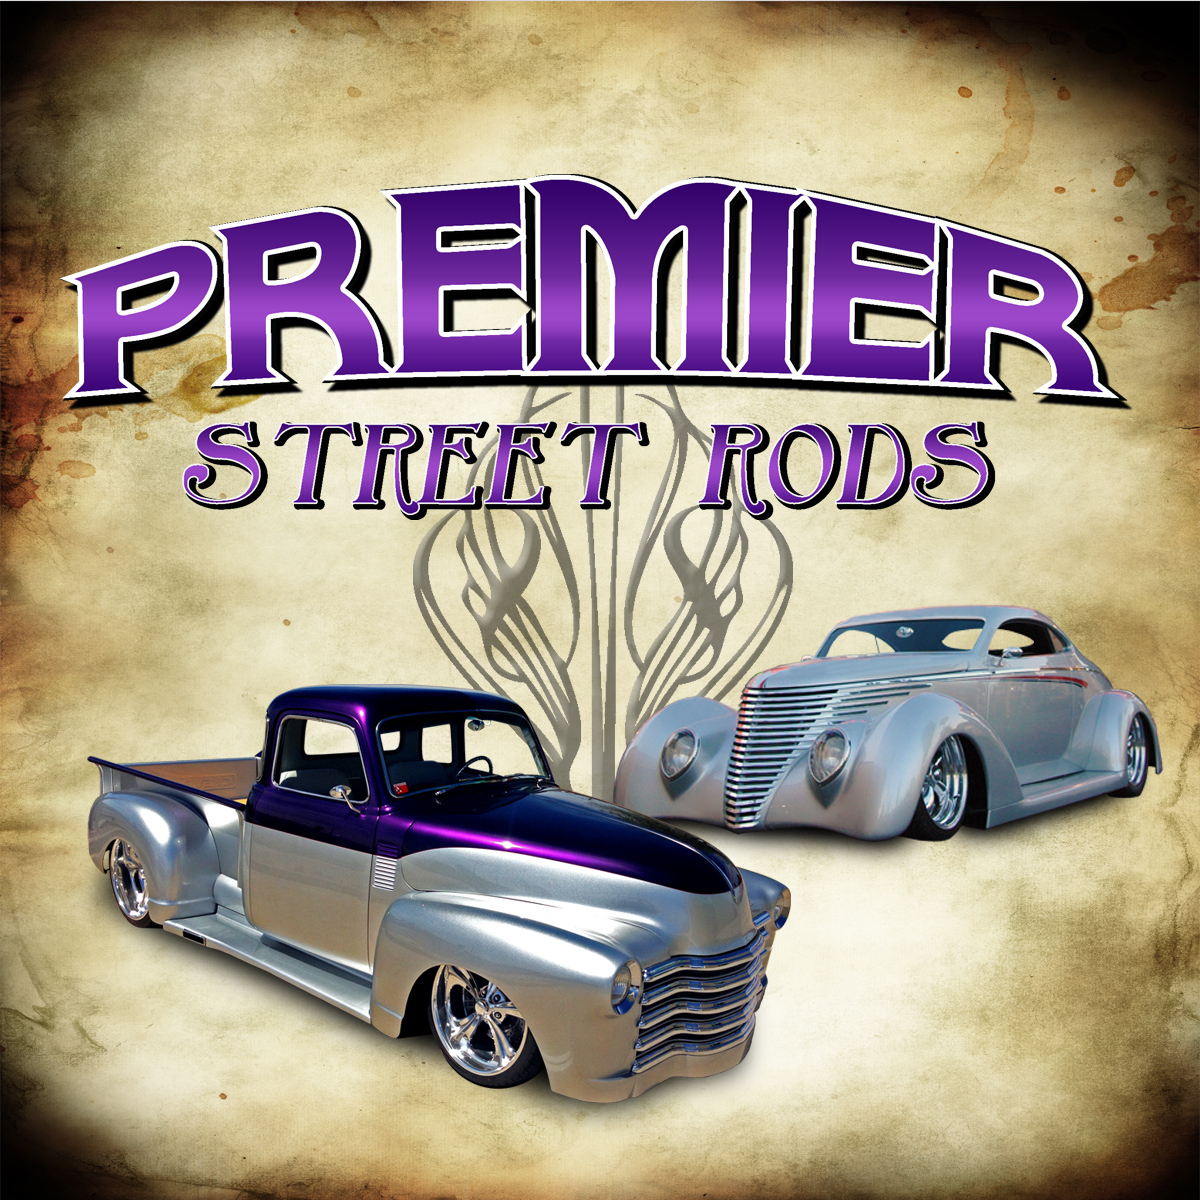 Premier Street Rods